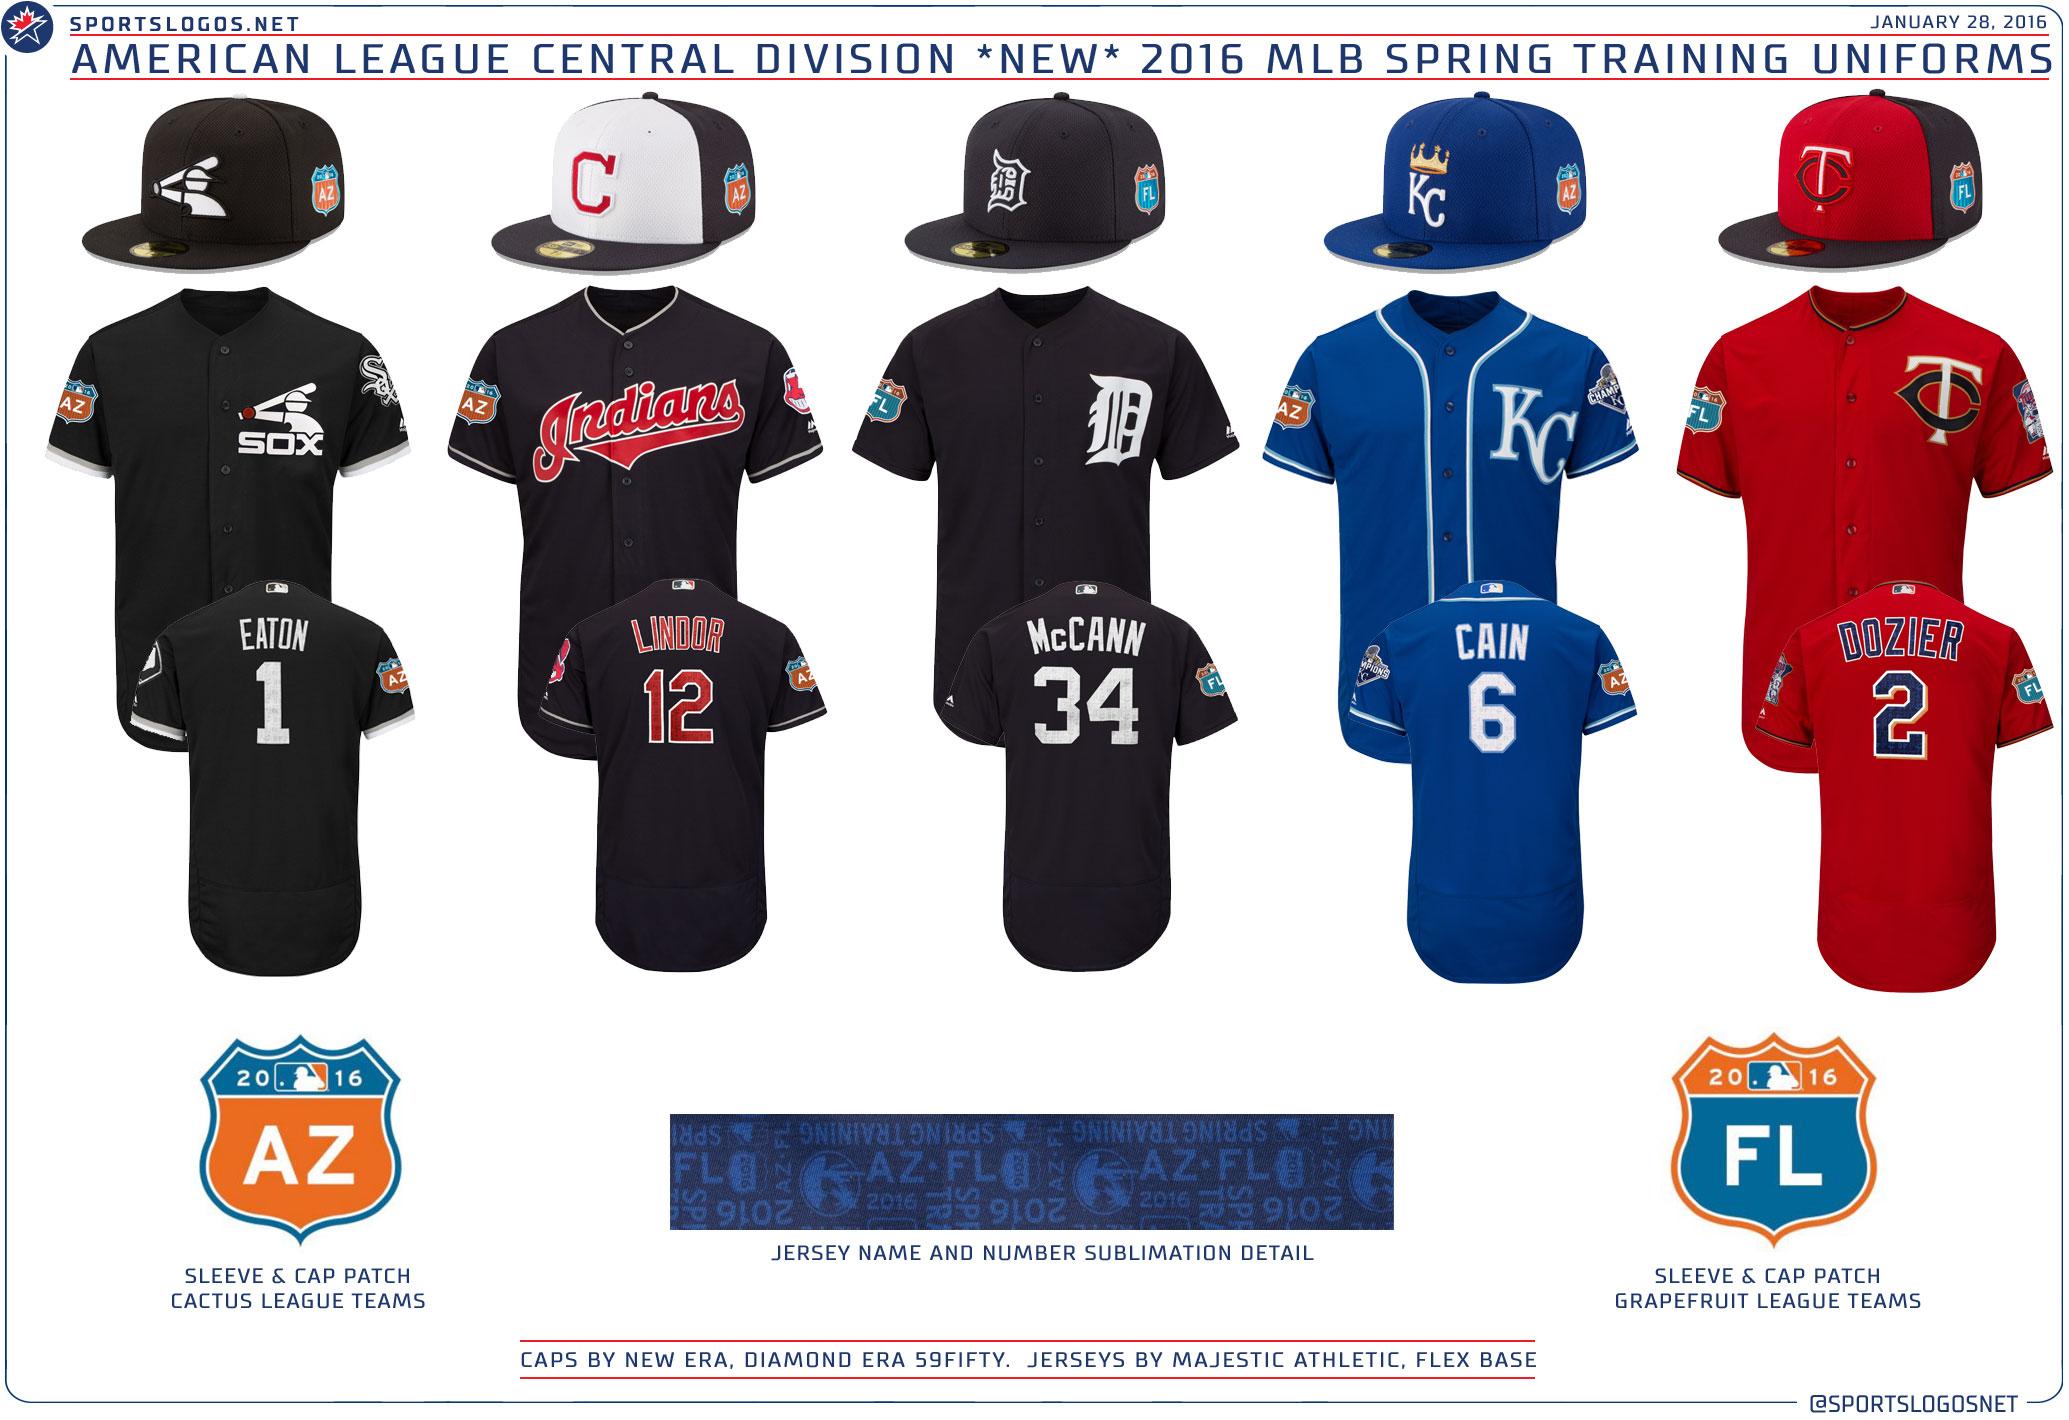 280fa2af8da 2016 Spring Training Uniforms - AL Central White Sox Indians Tigers Royals  Twins